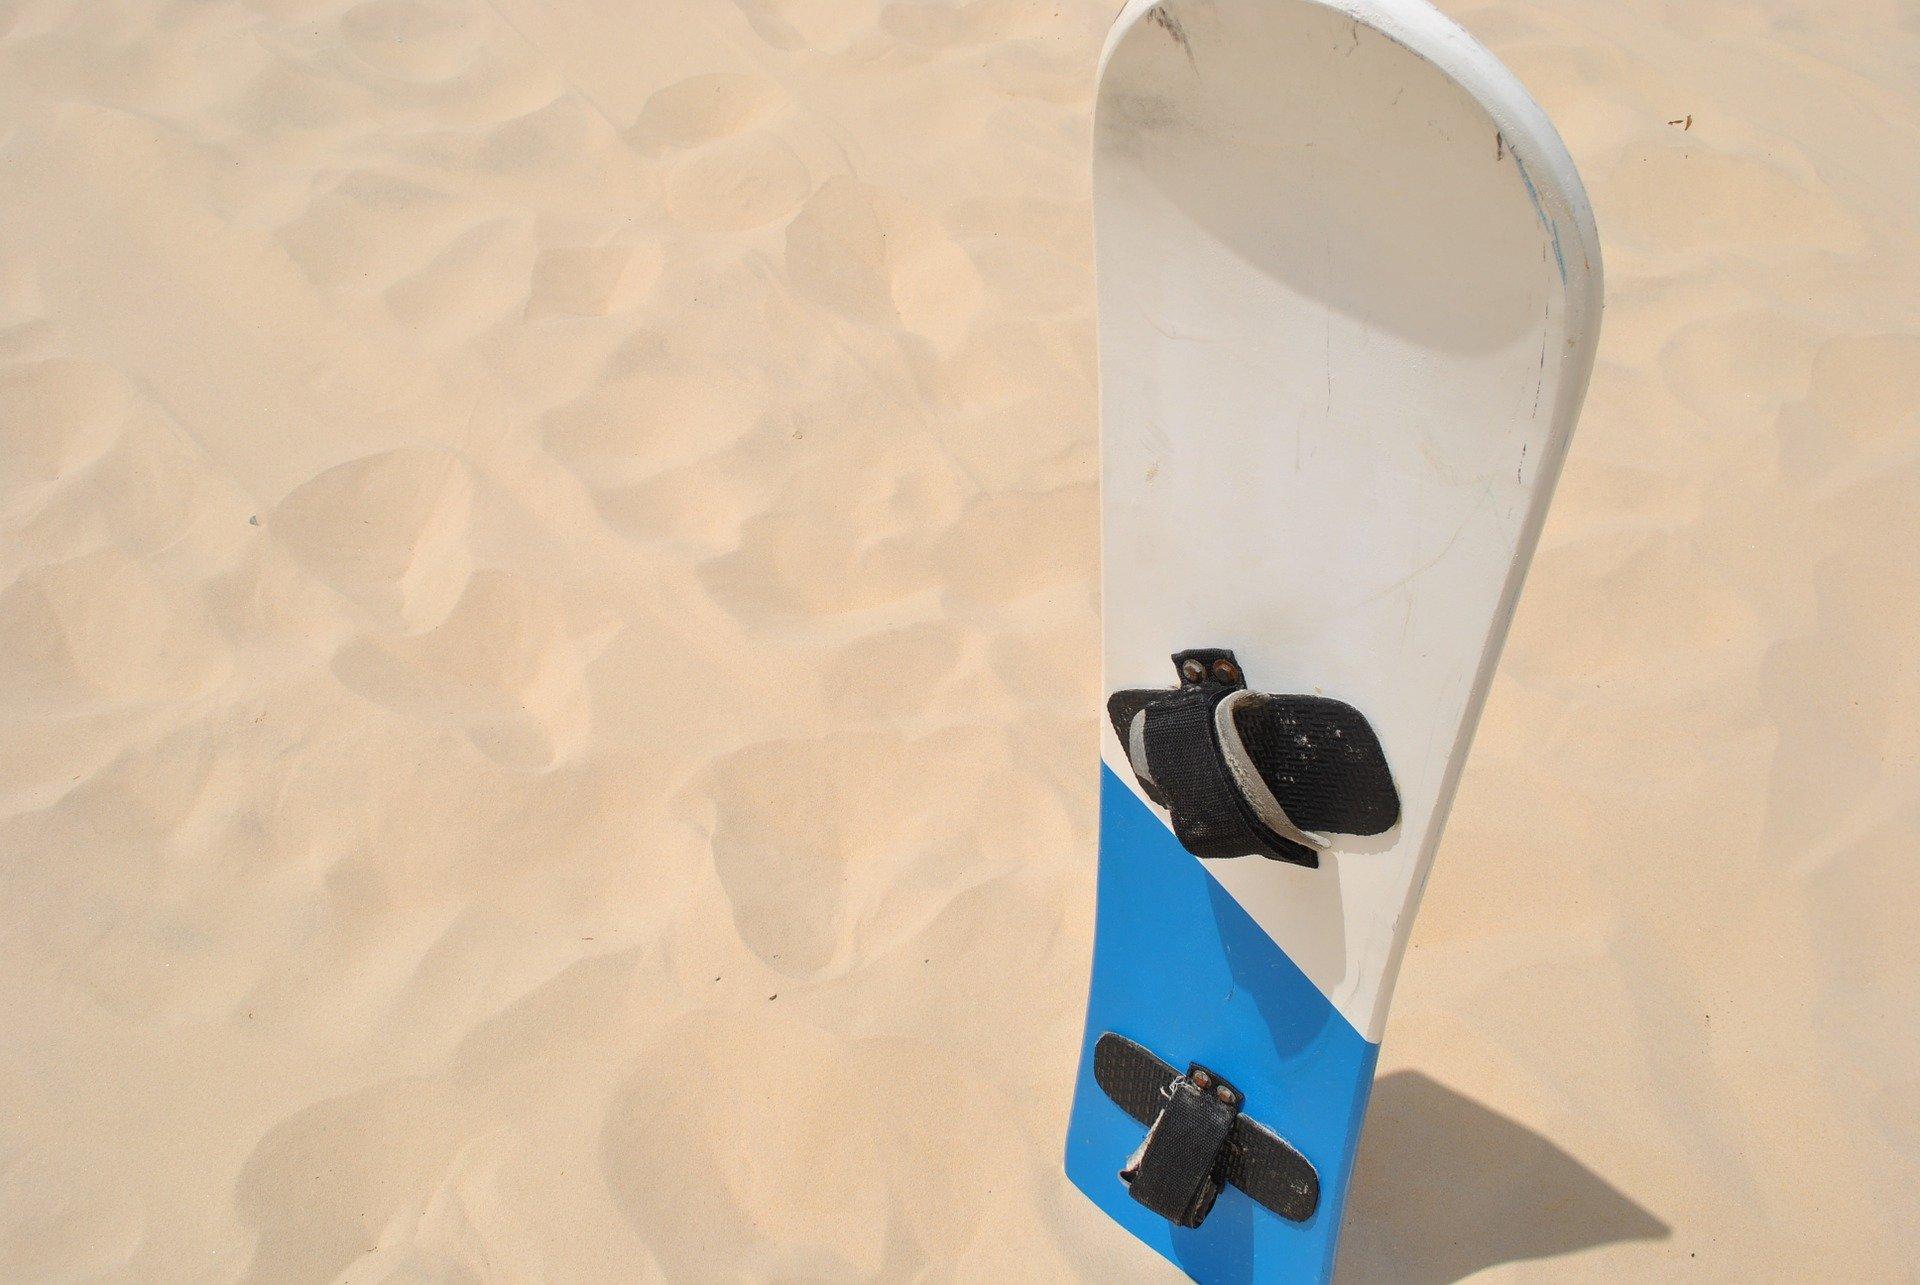 Best wax for sandboarding and sand dune sledding